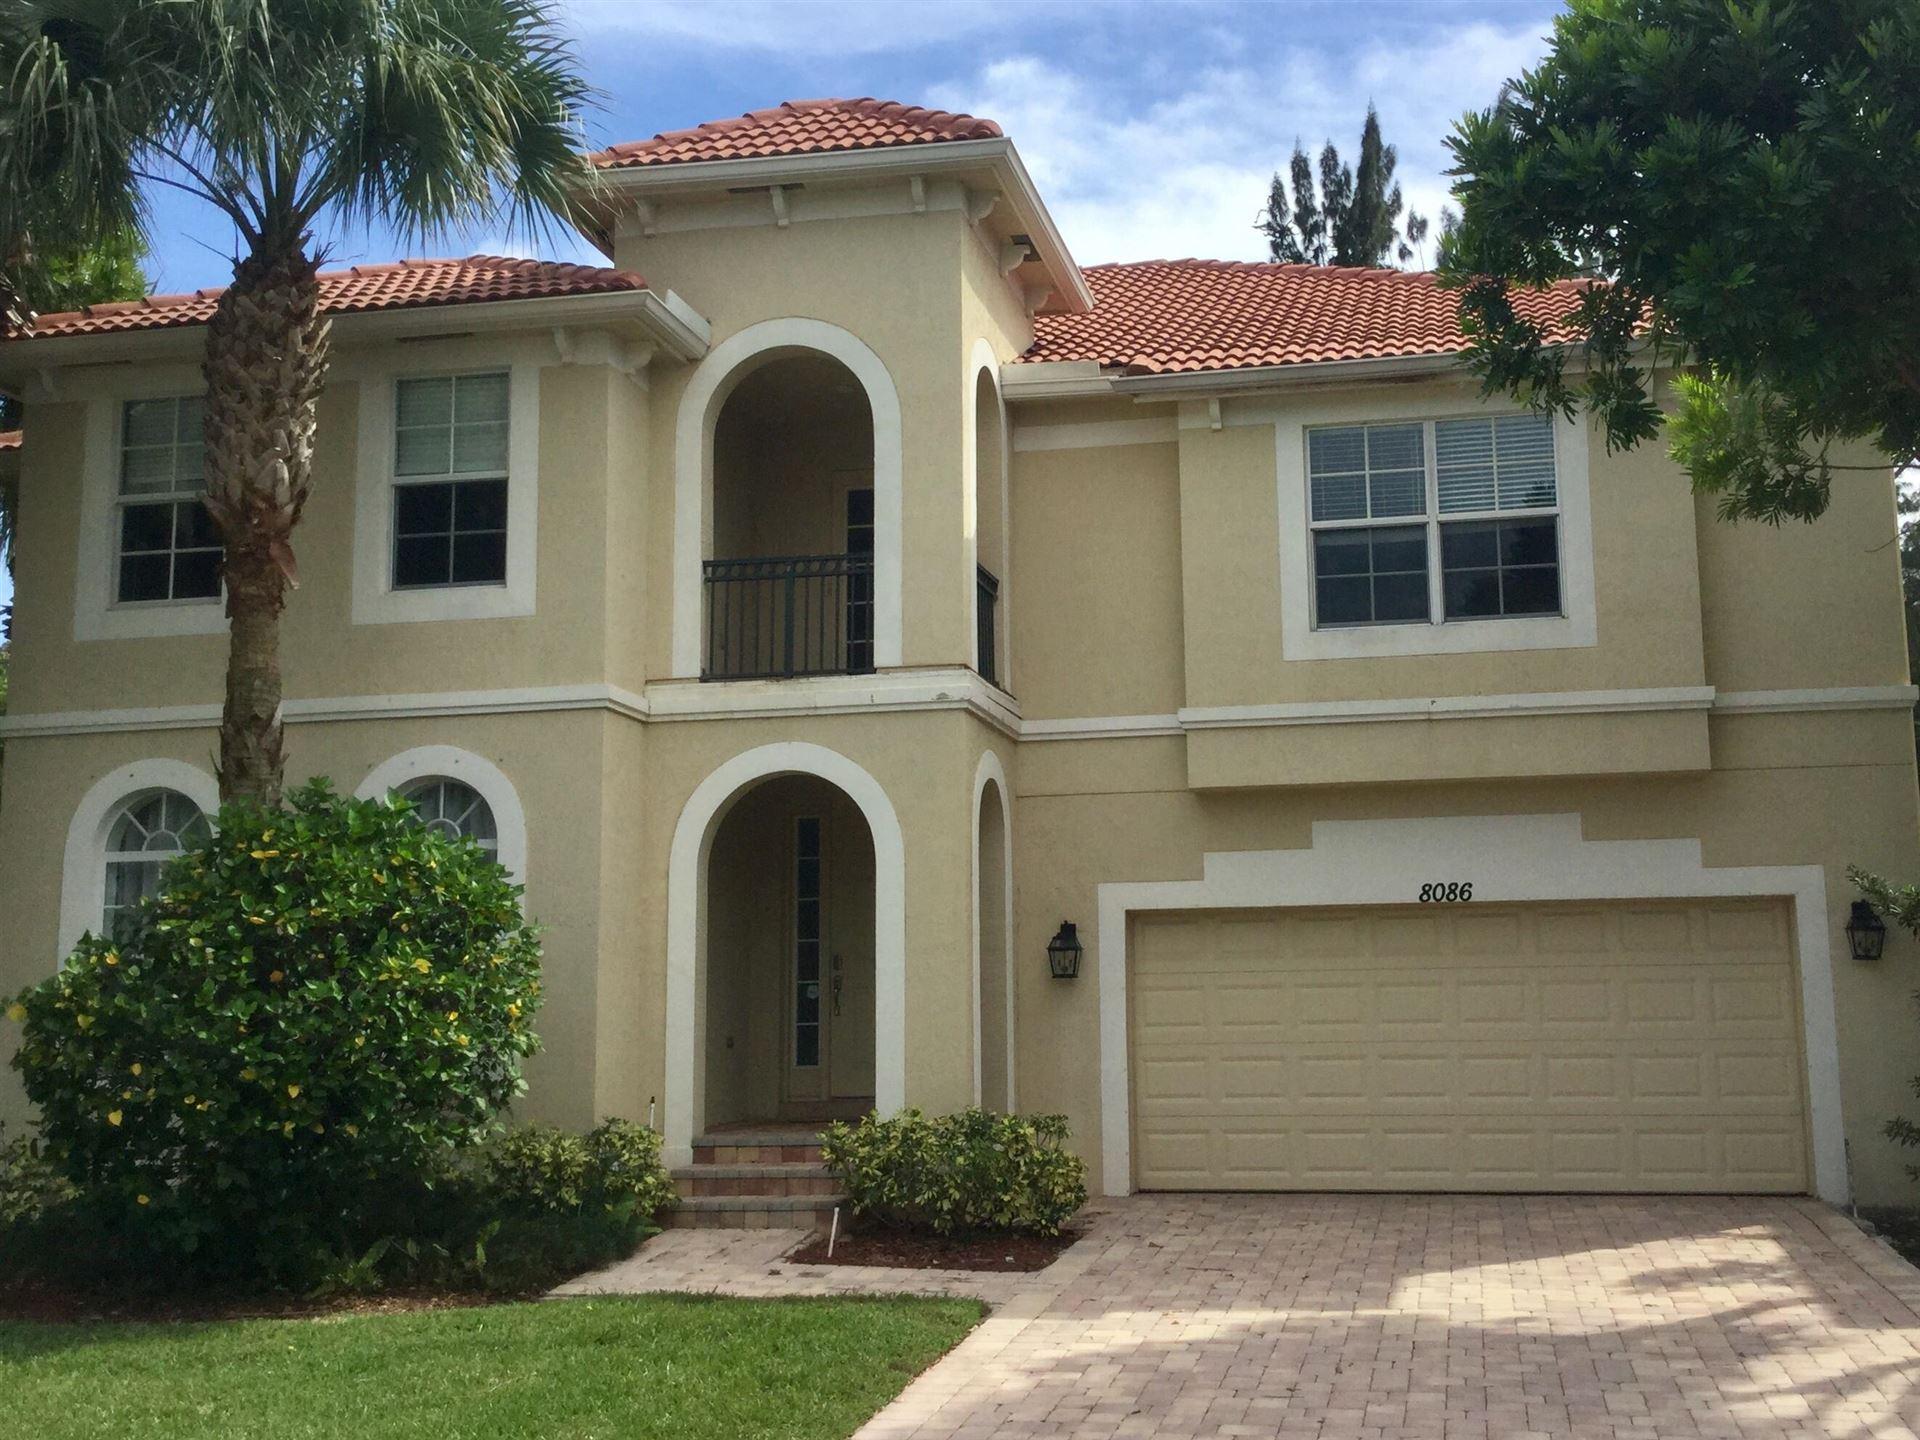 Photo for 8086 Bautista Way, Palm Beach Gardens, FL 33418 (MLS # RX-10750522)